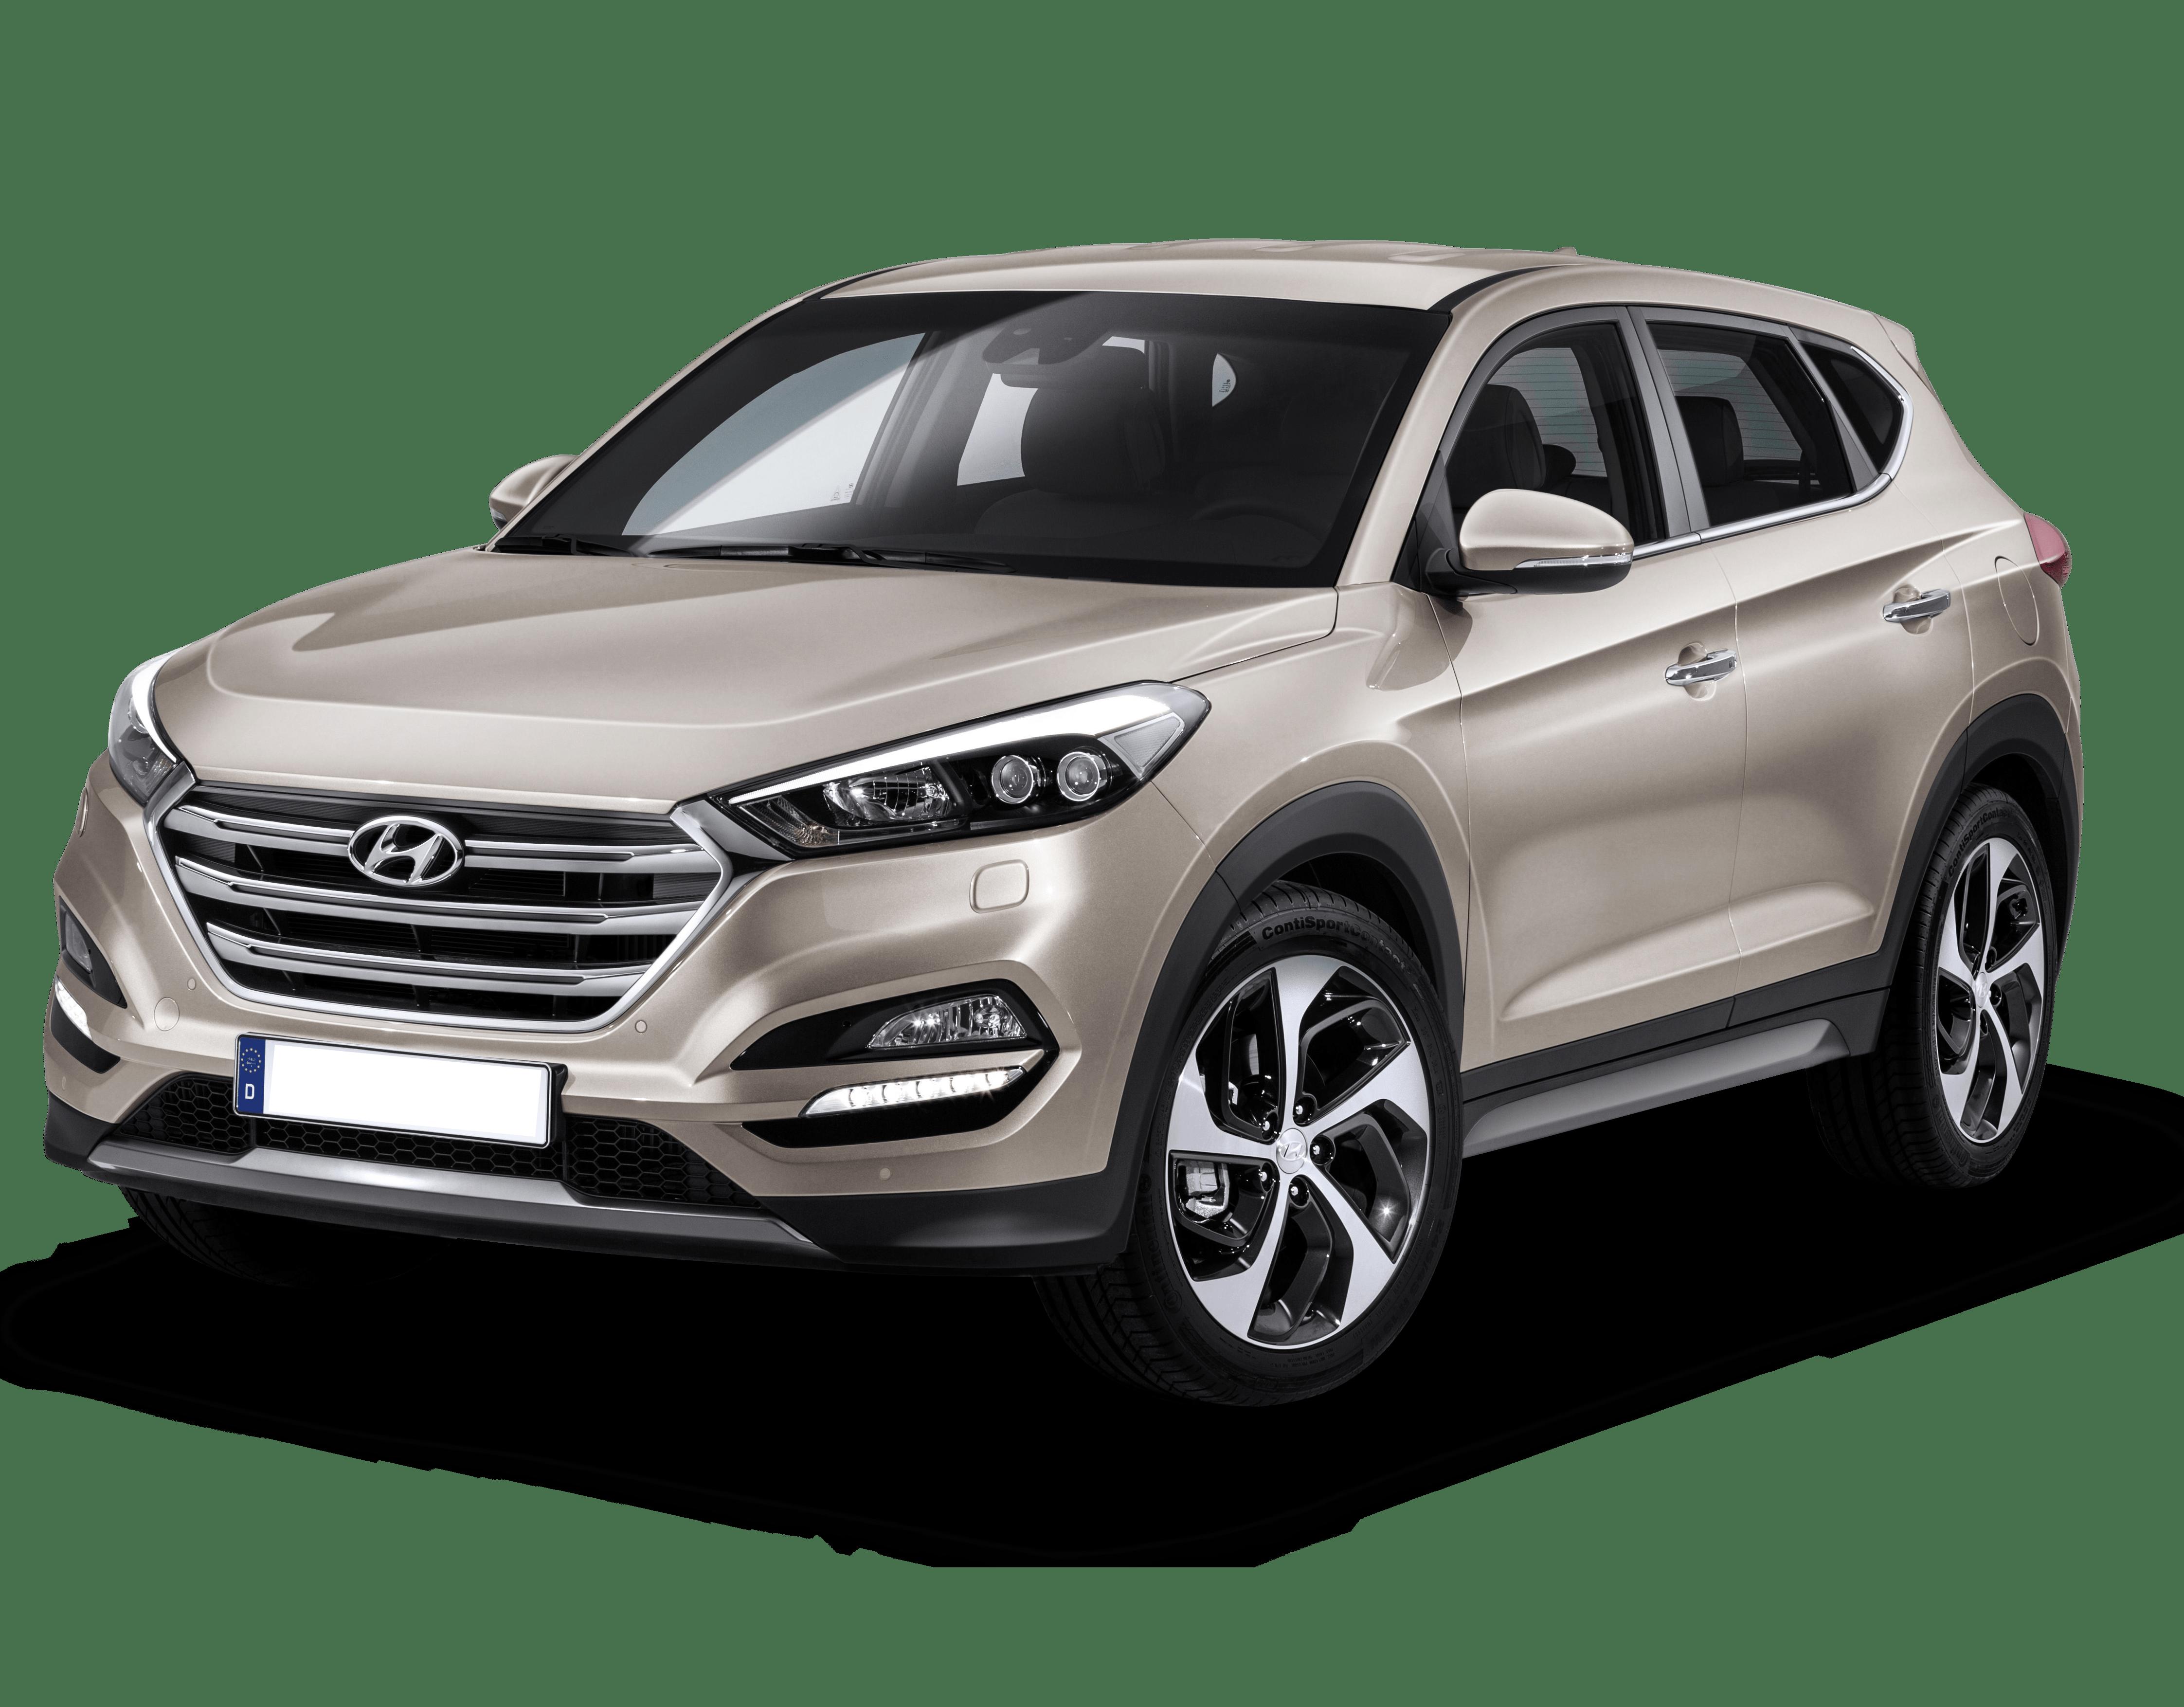 tuscon wheels hyundai news improved for ca tucson